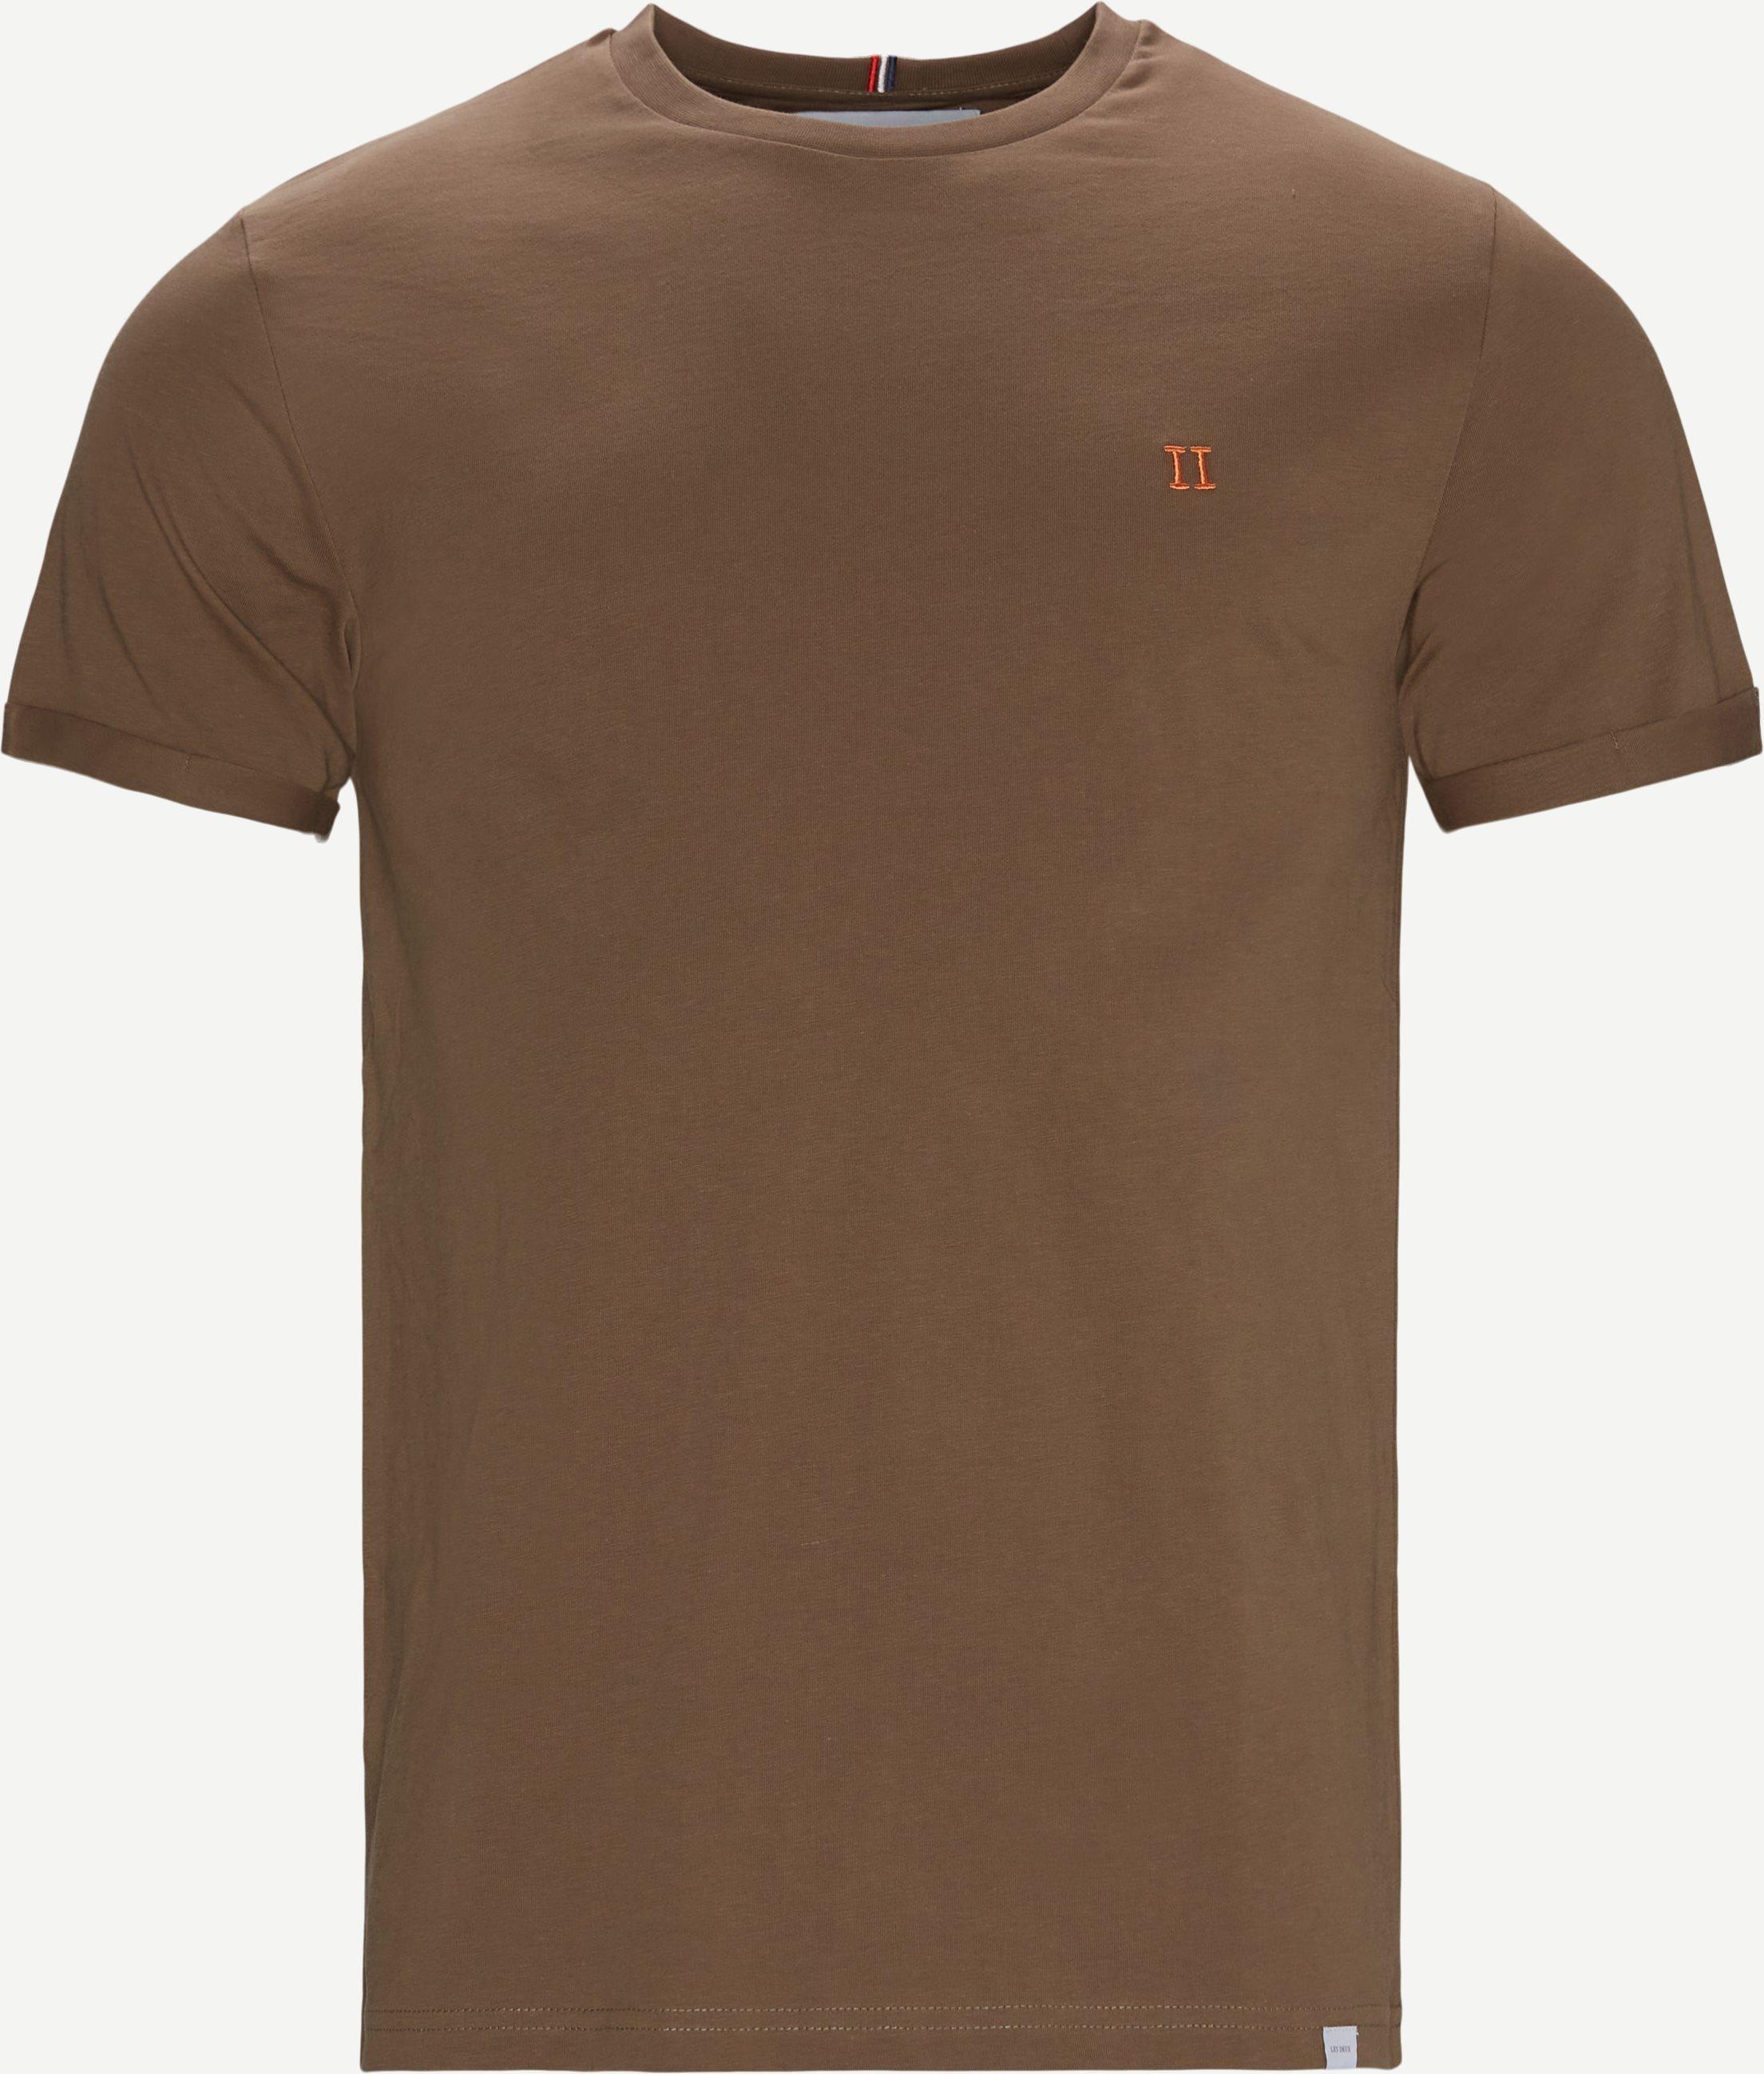 Nørregaard T-shirt - T-shirts - Regular fit - Brun